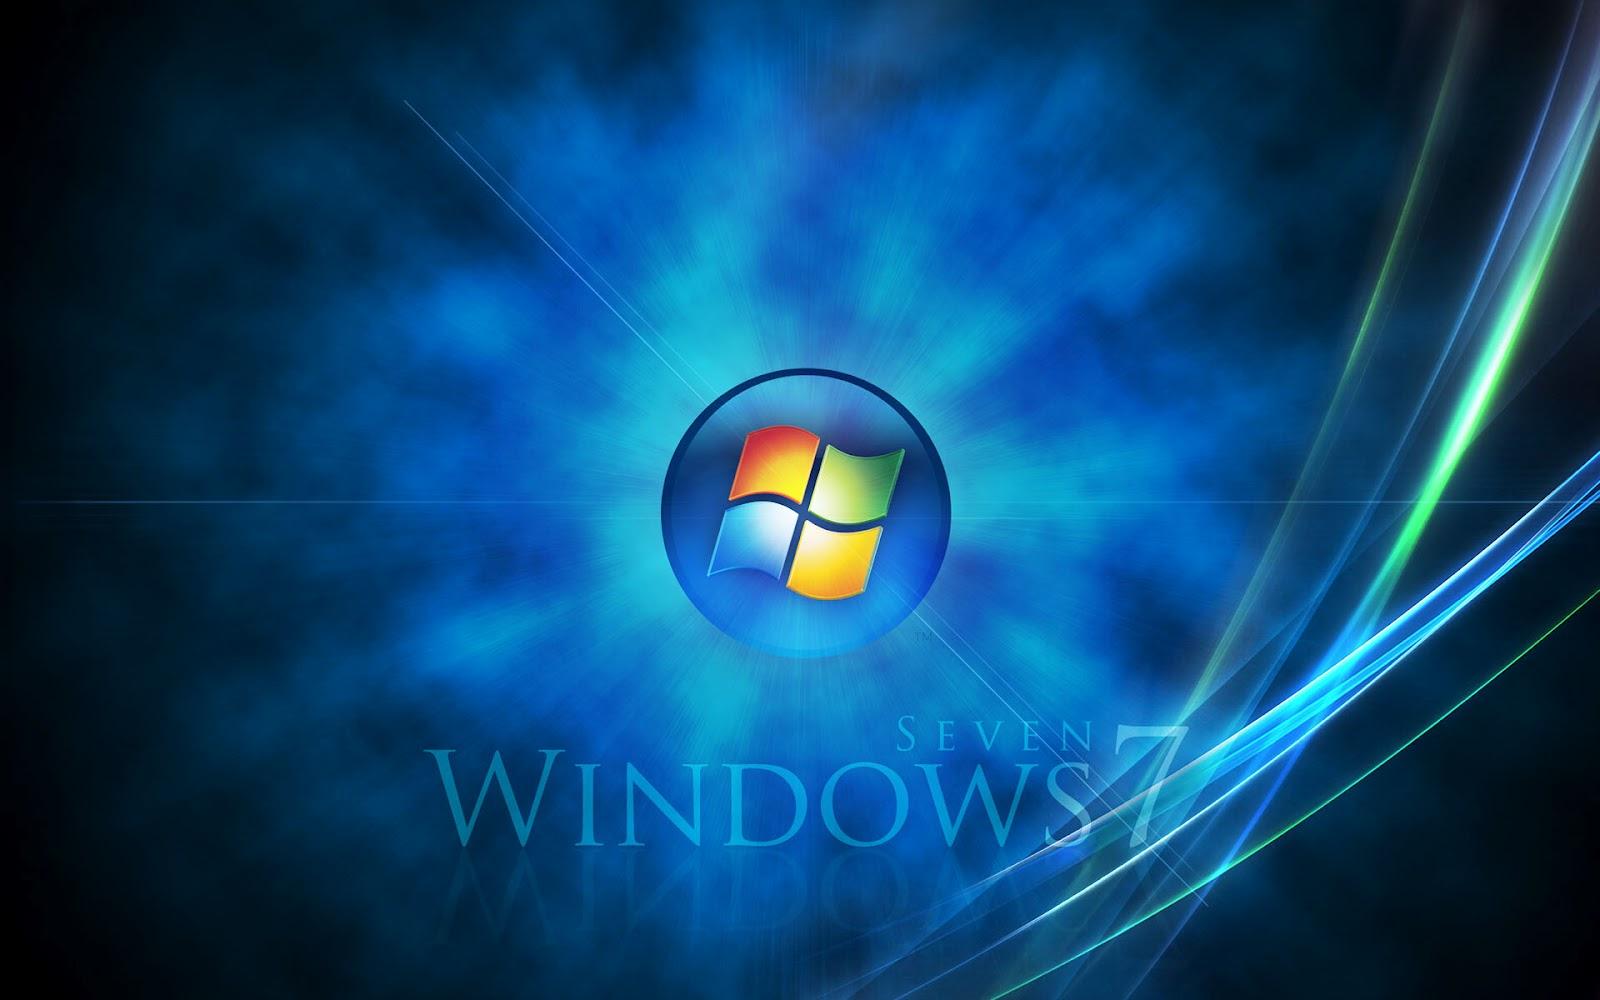 Windows 7 Themes Wallpaper Windows 7 original wal...